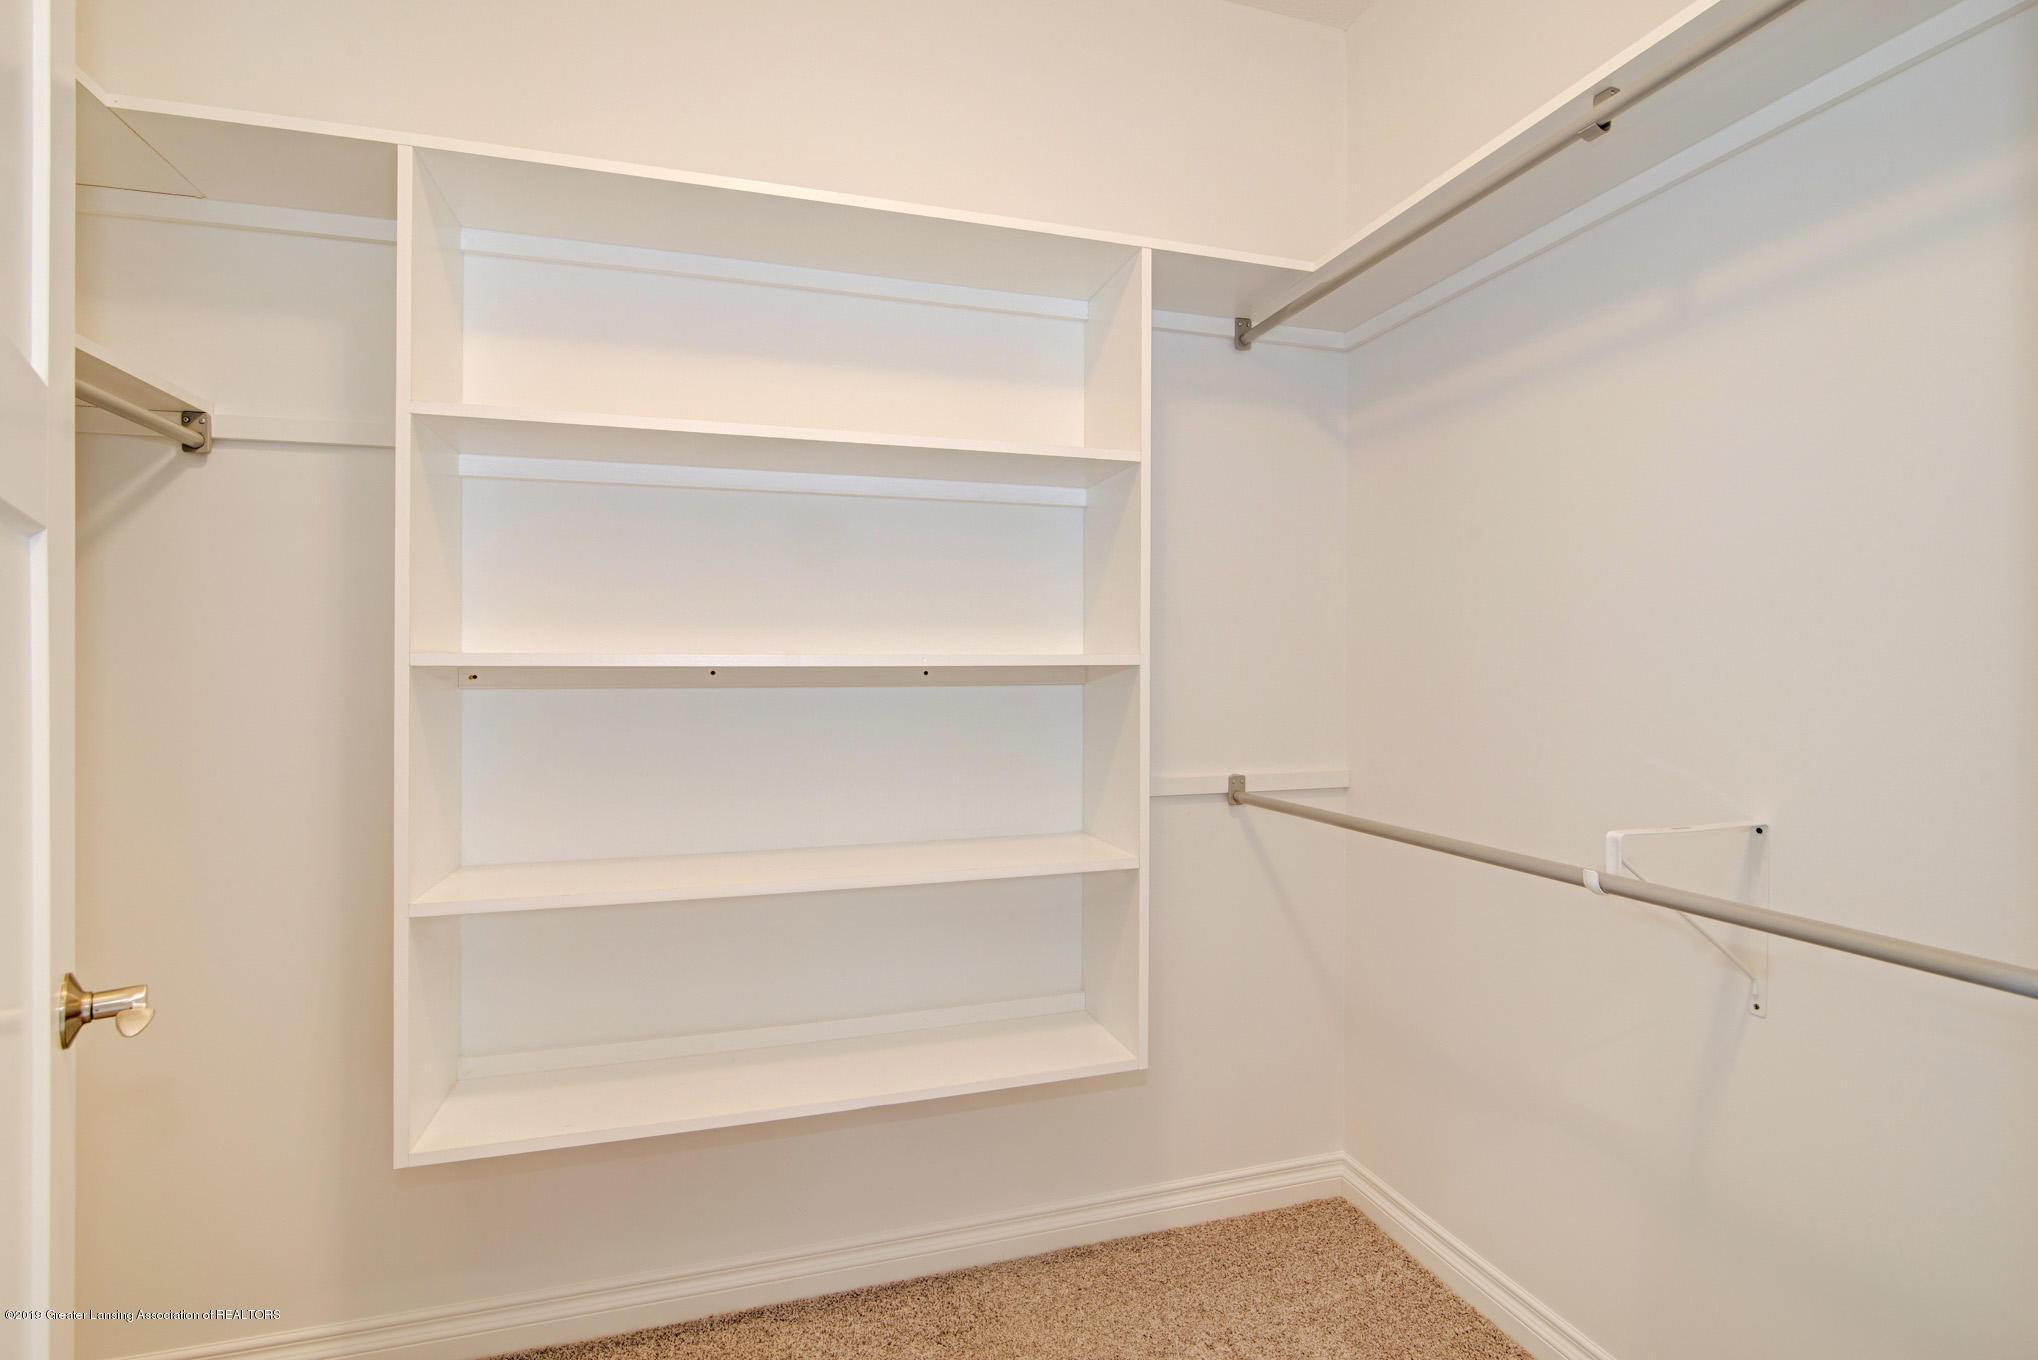 805 Greenwich Dr - master closet - 14